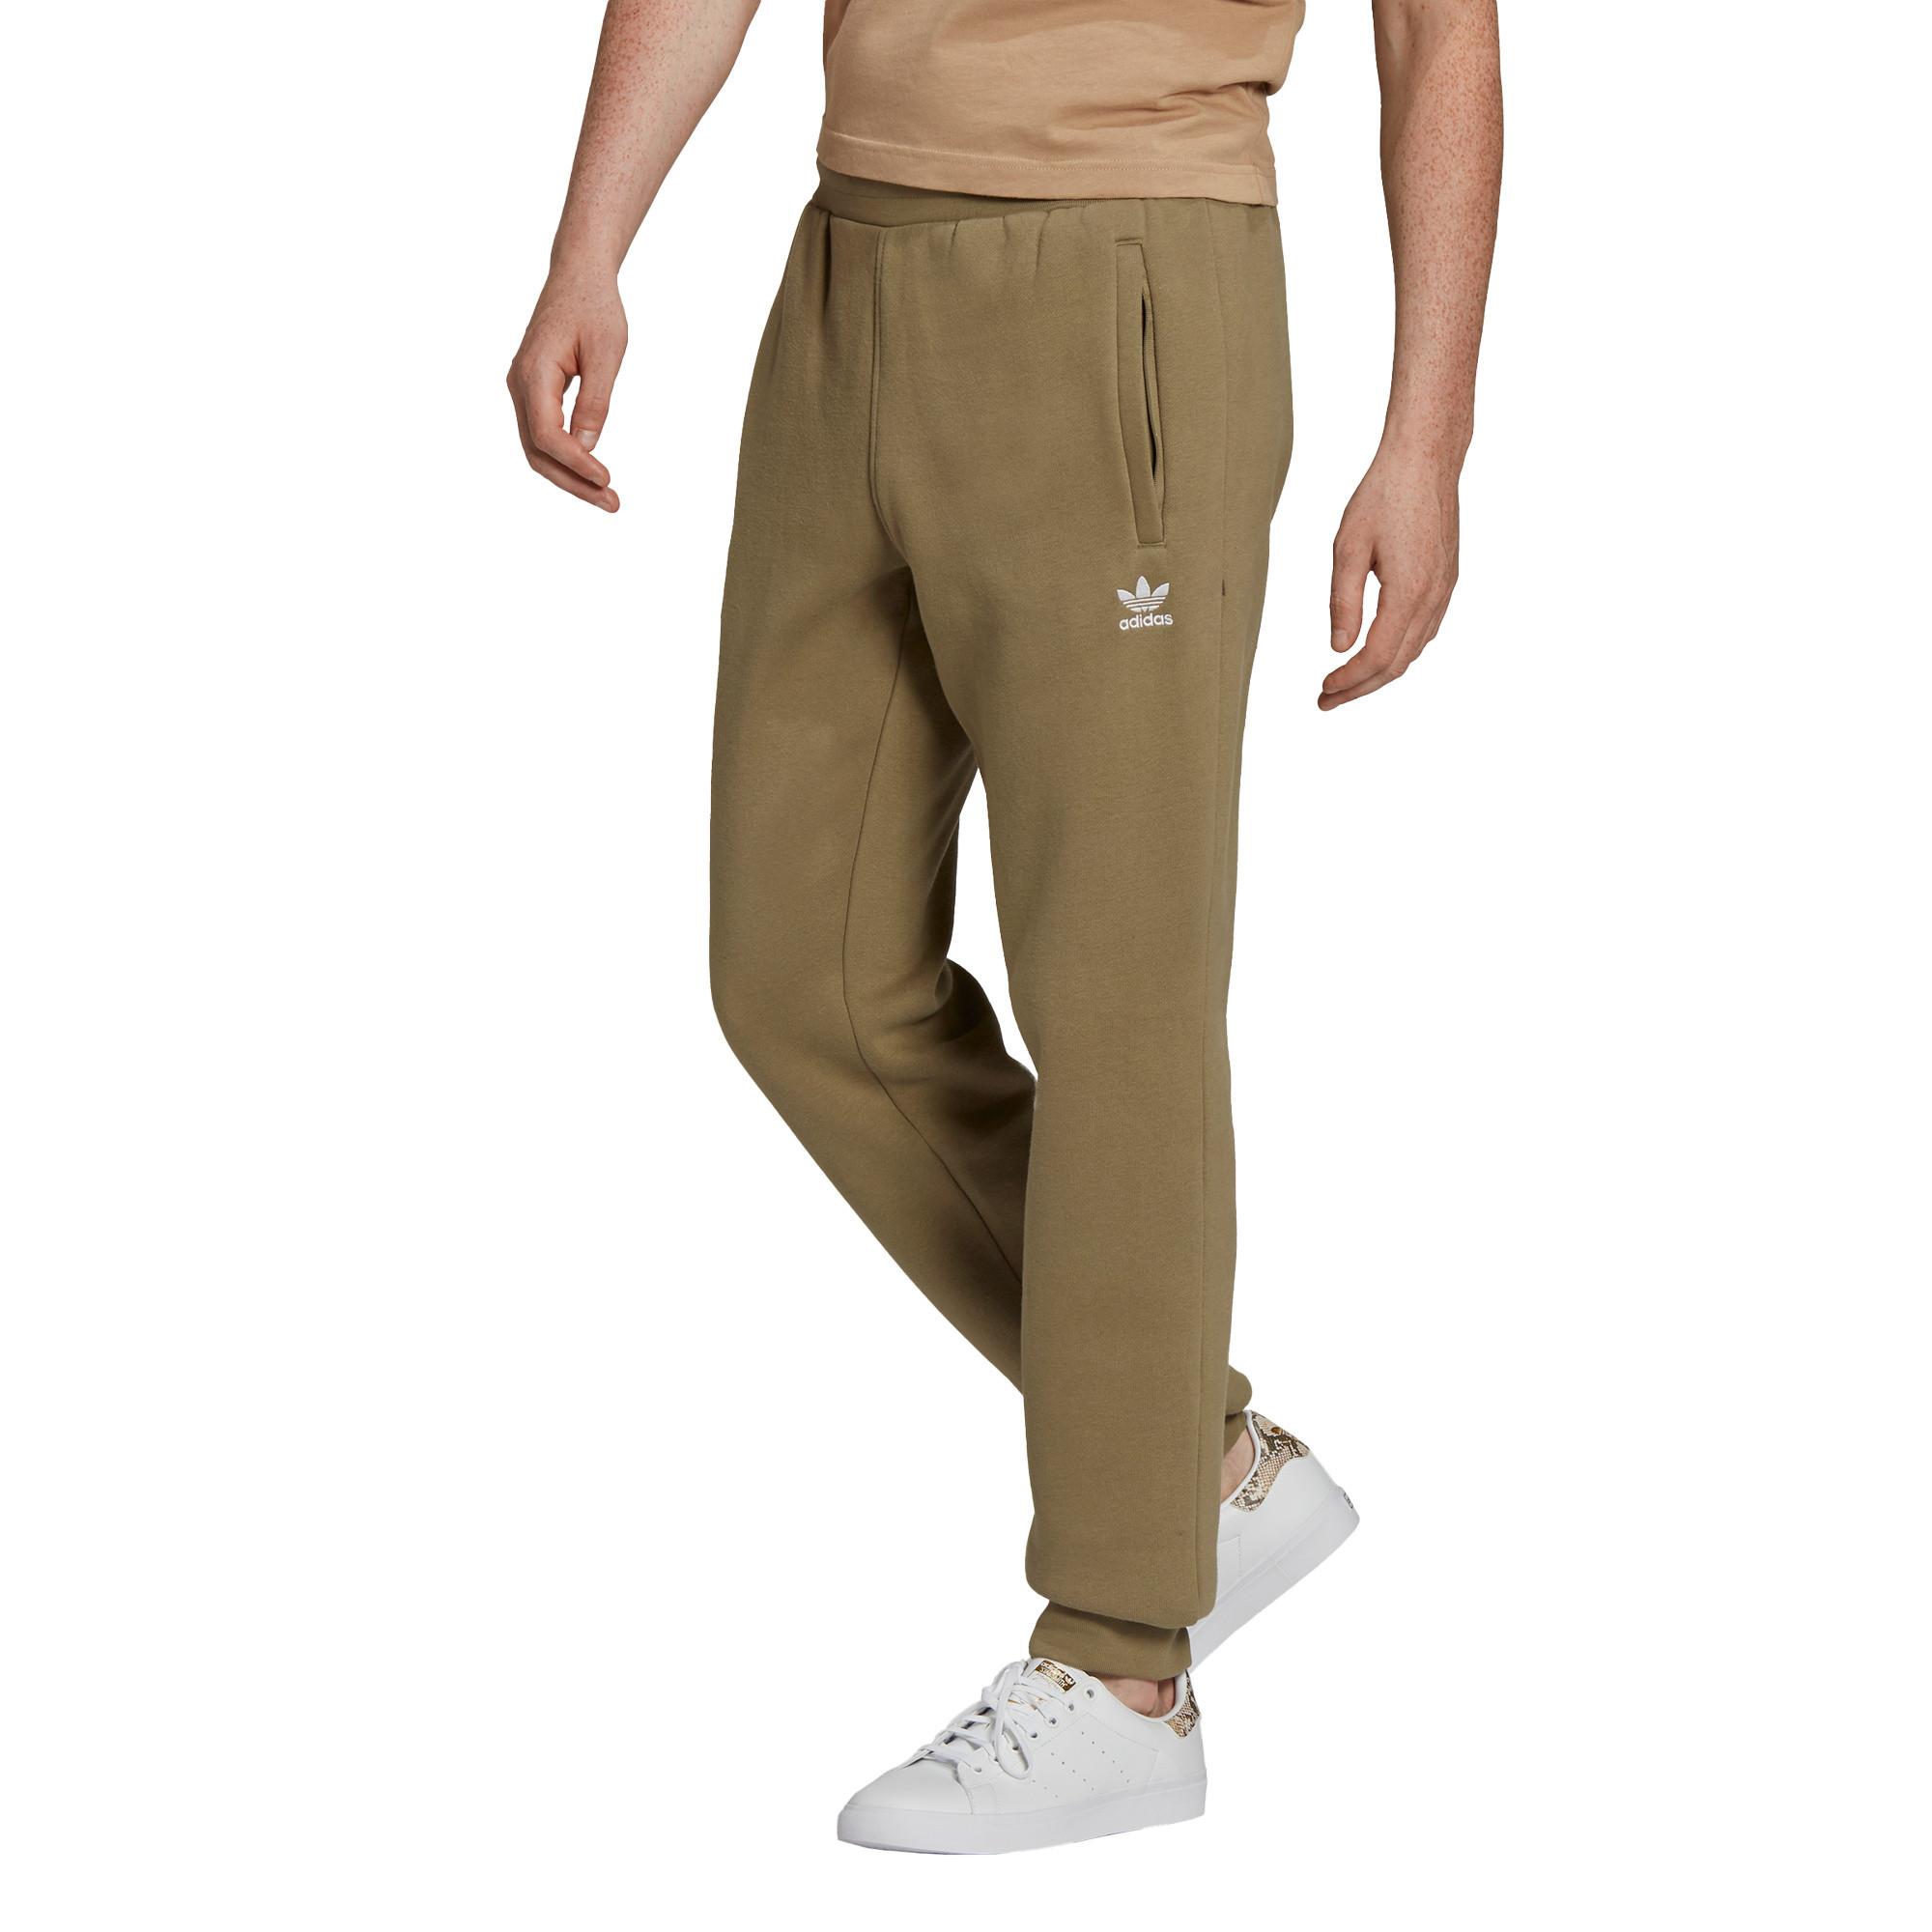 Pantaloni adicolor Essentials Trefoil, Verde, large image number 2